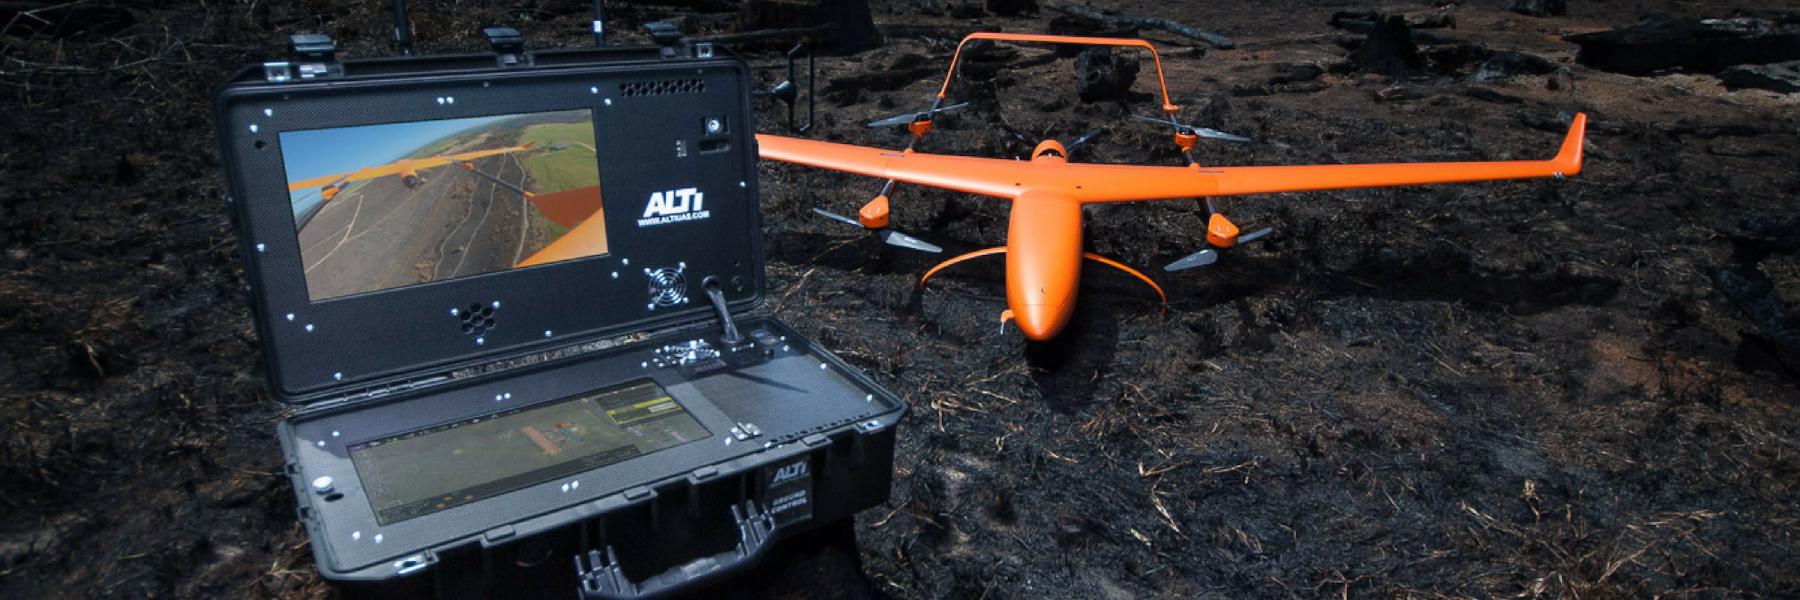 ALTI_UAV_UAS-Drone-Major-Consultancy-Services-Solutions-Hub